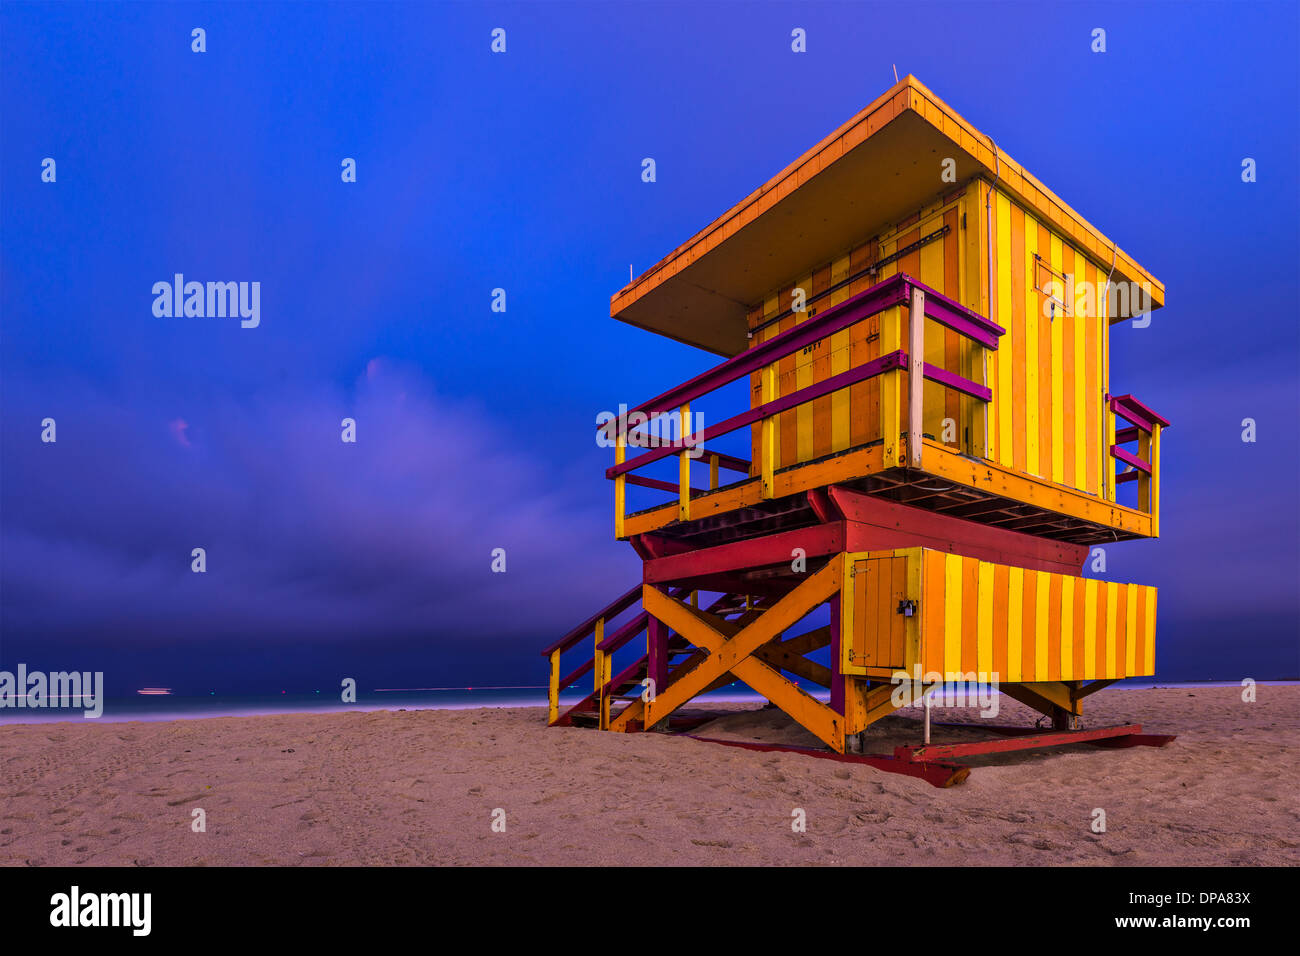 South Beach, Miami, Florida, USA lifeguard post at twilight. - Stock Image